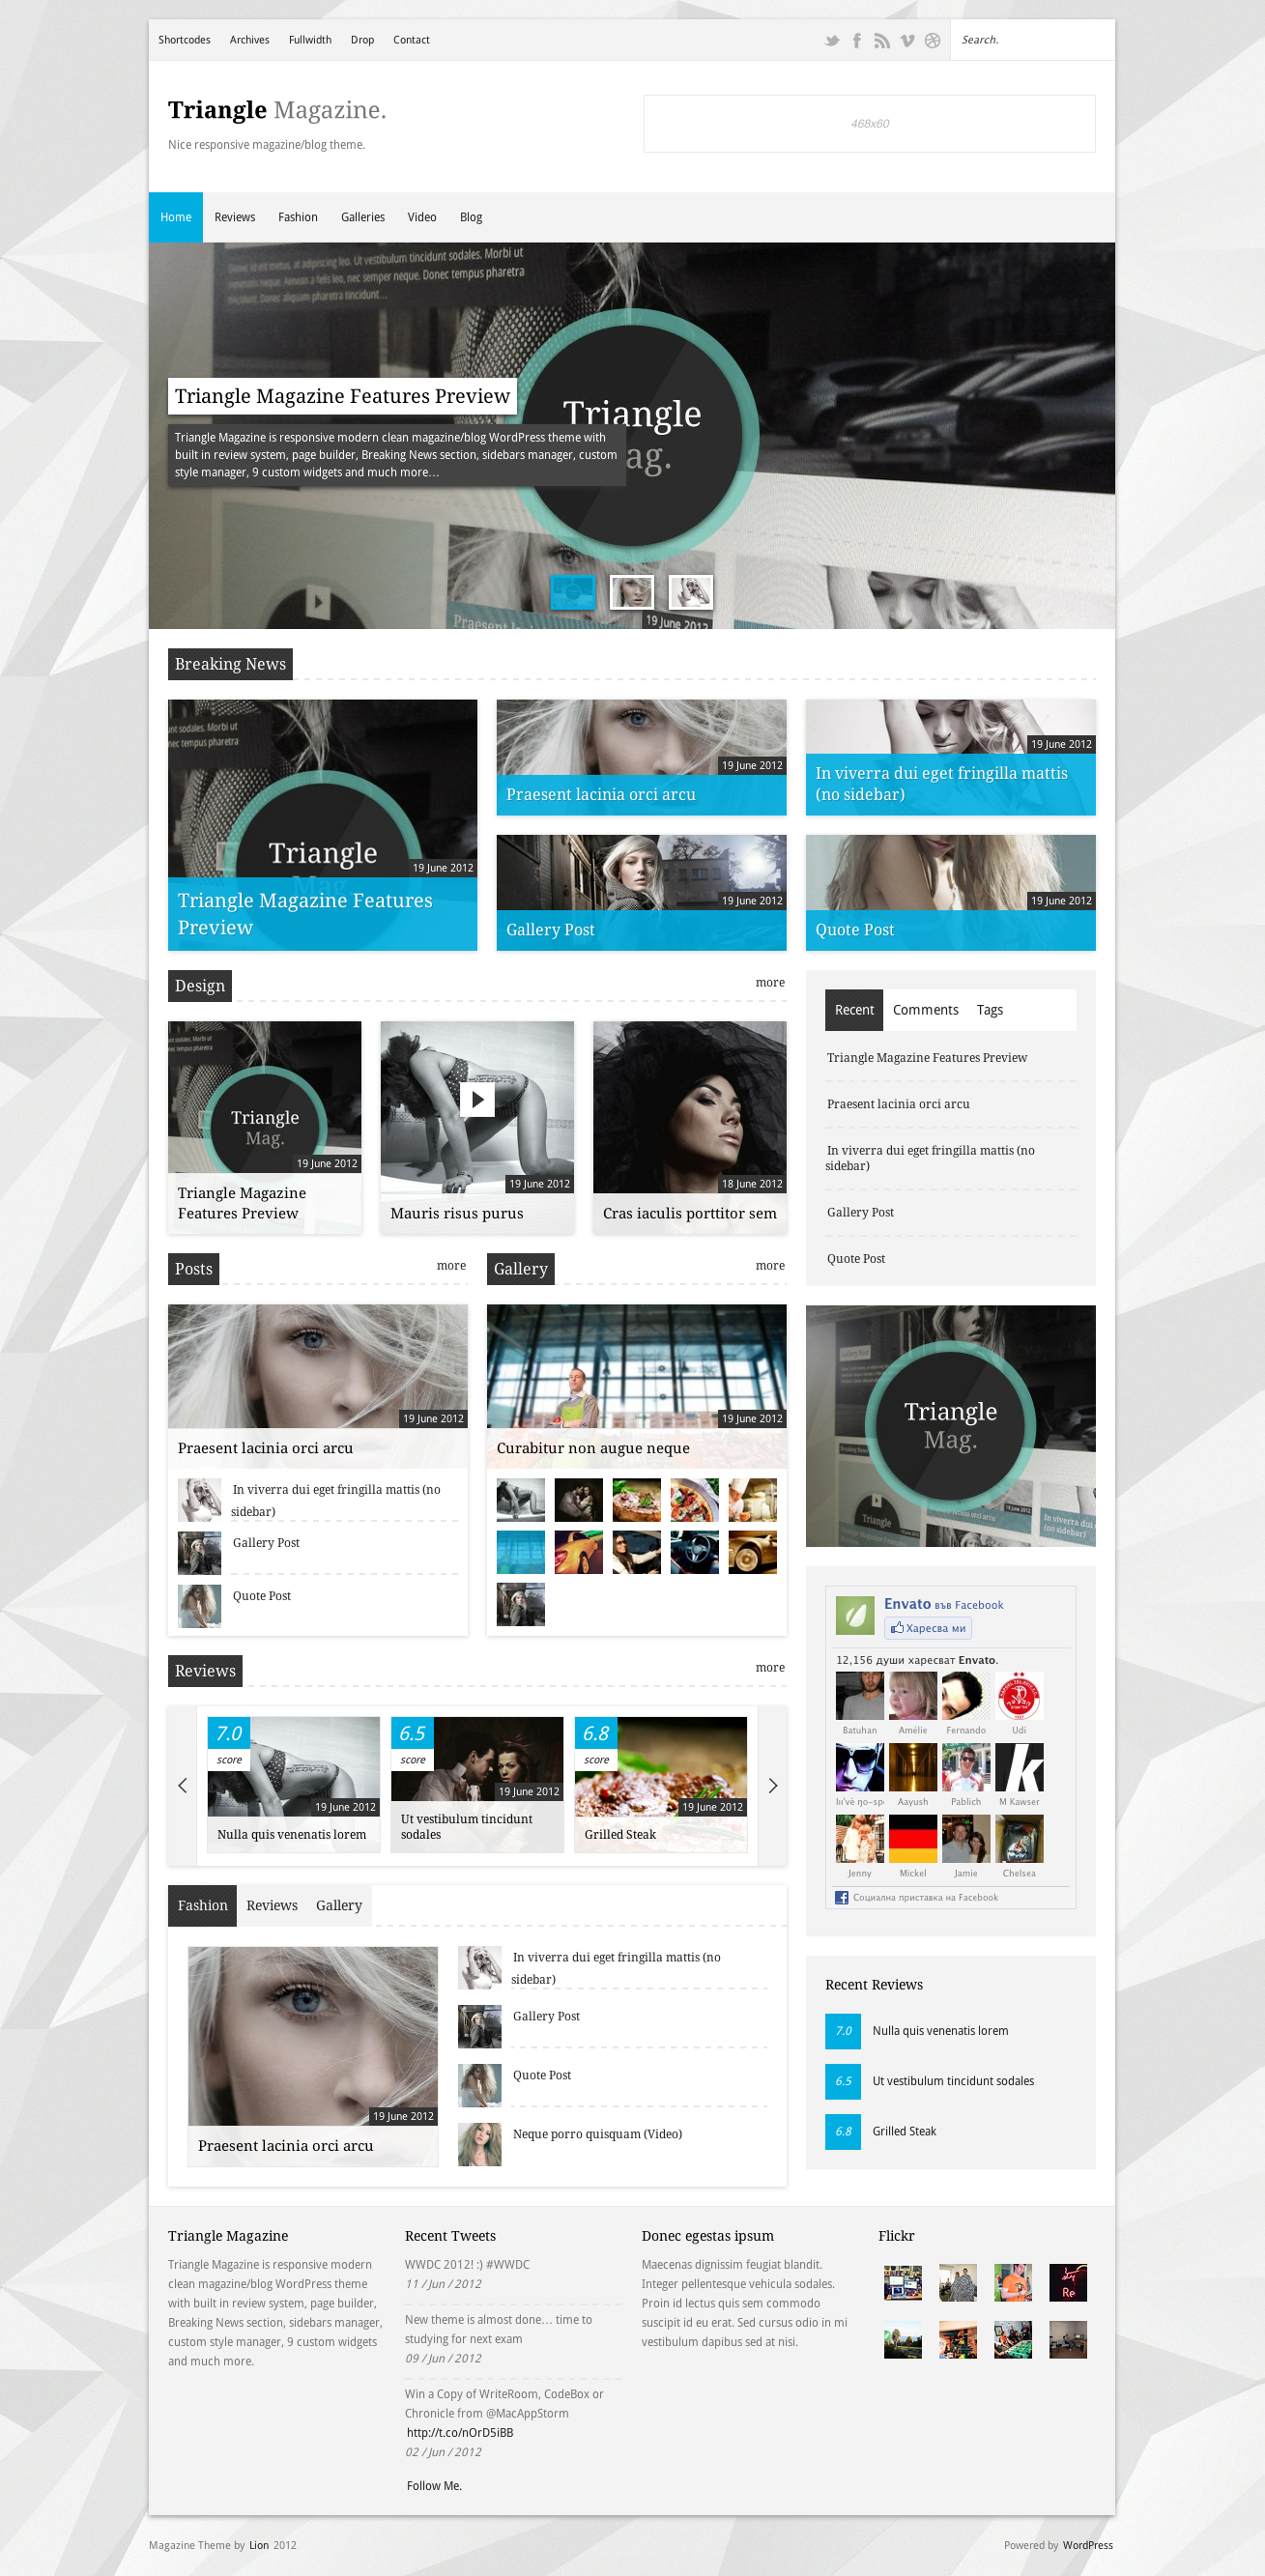 http://0.s3.envato.com/files/44150491/screenshots/02_magazine.png